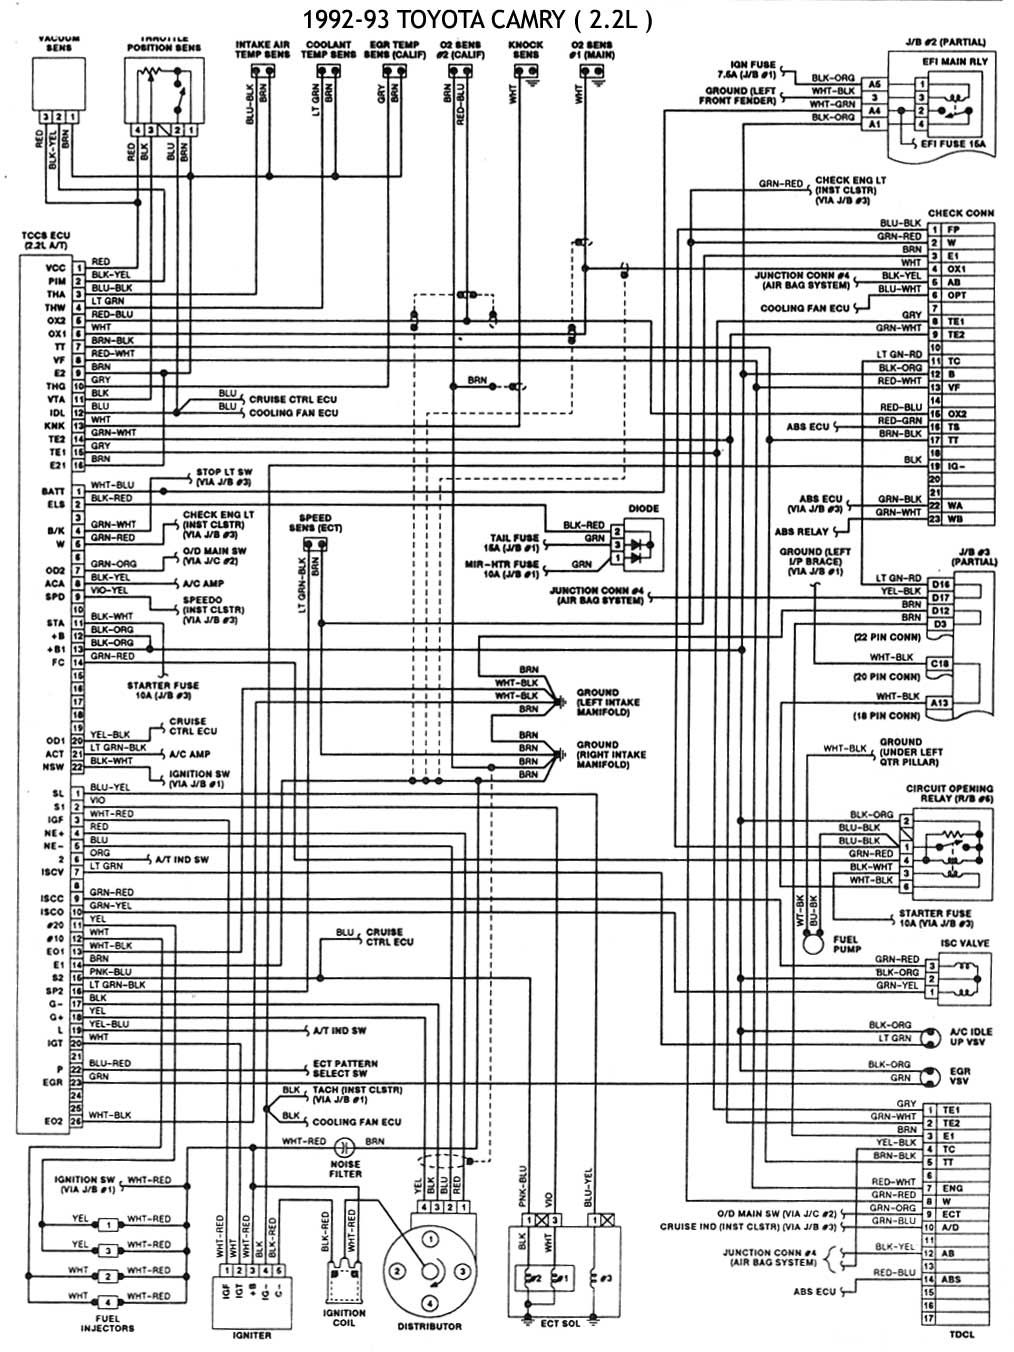 Diagrama Electrico Automotriz Toyota In 2020 Toyota Corolla Toyota Echo Toyota